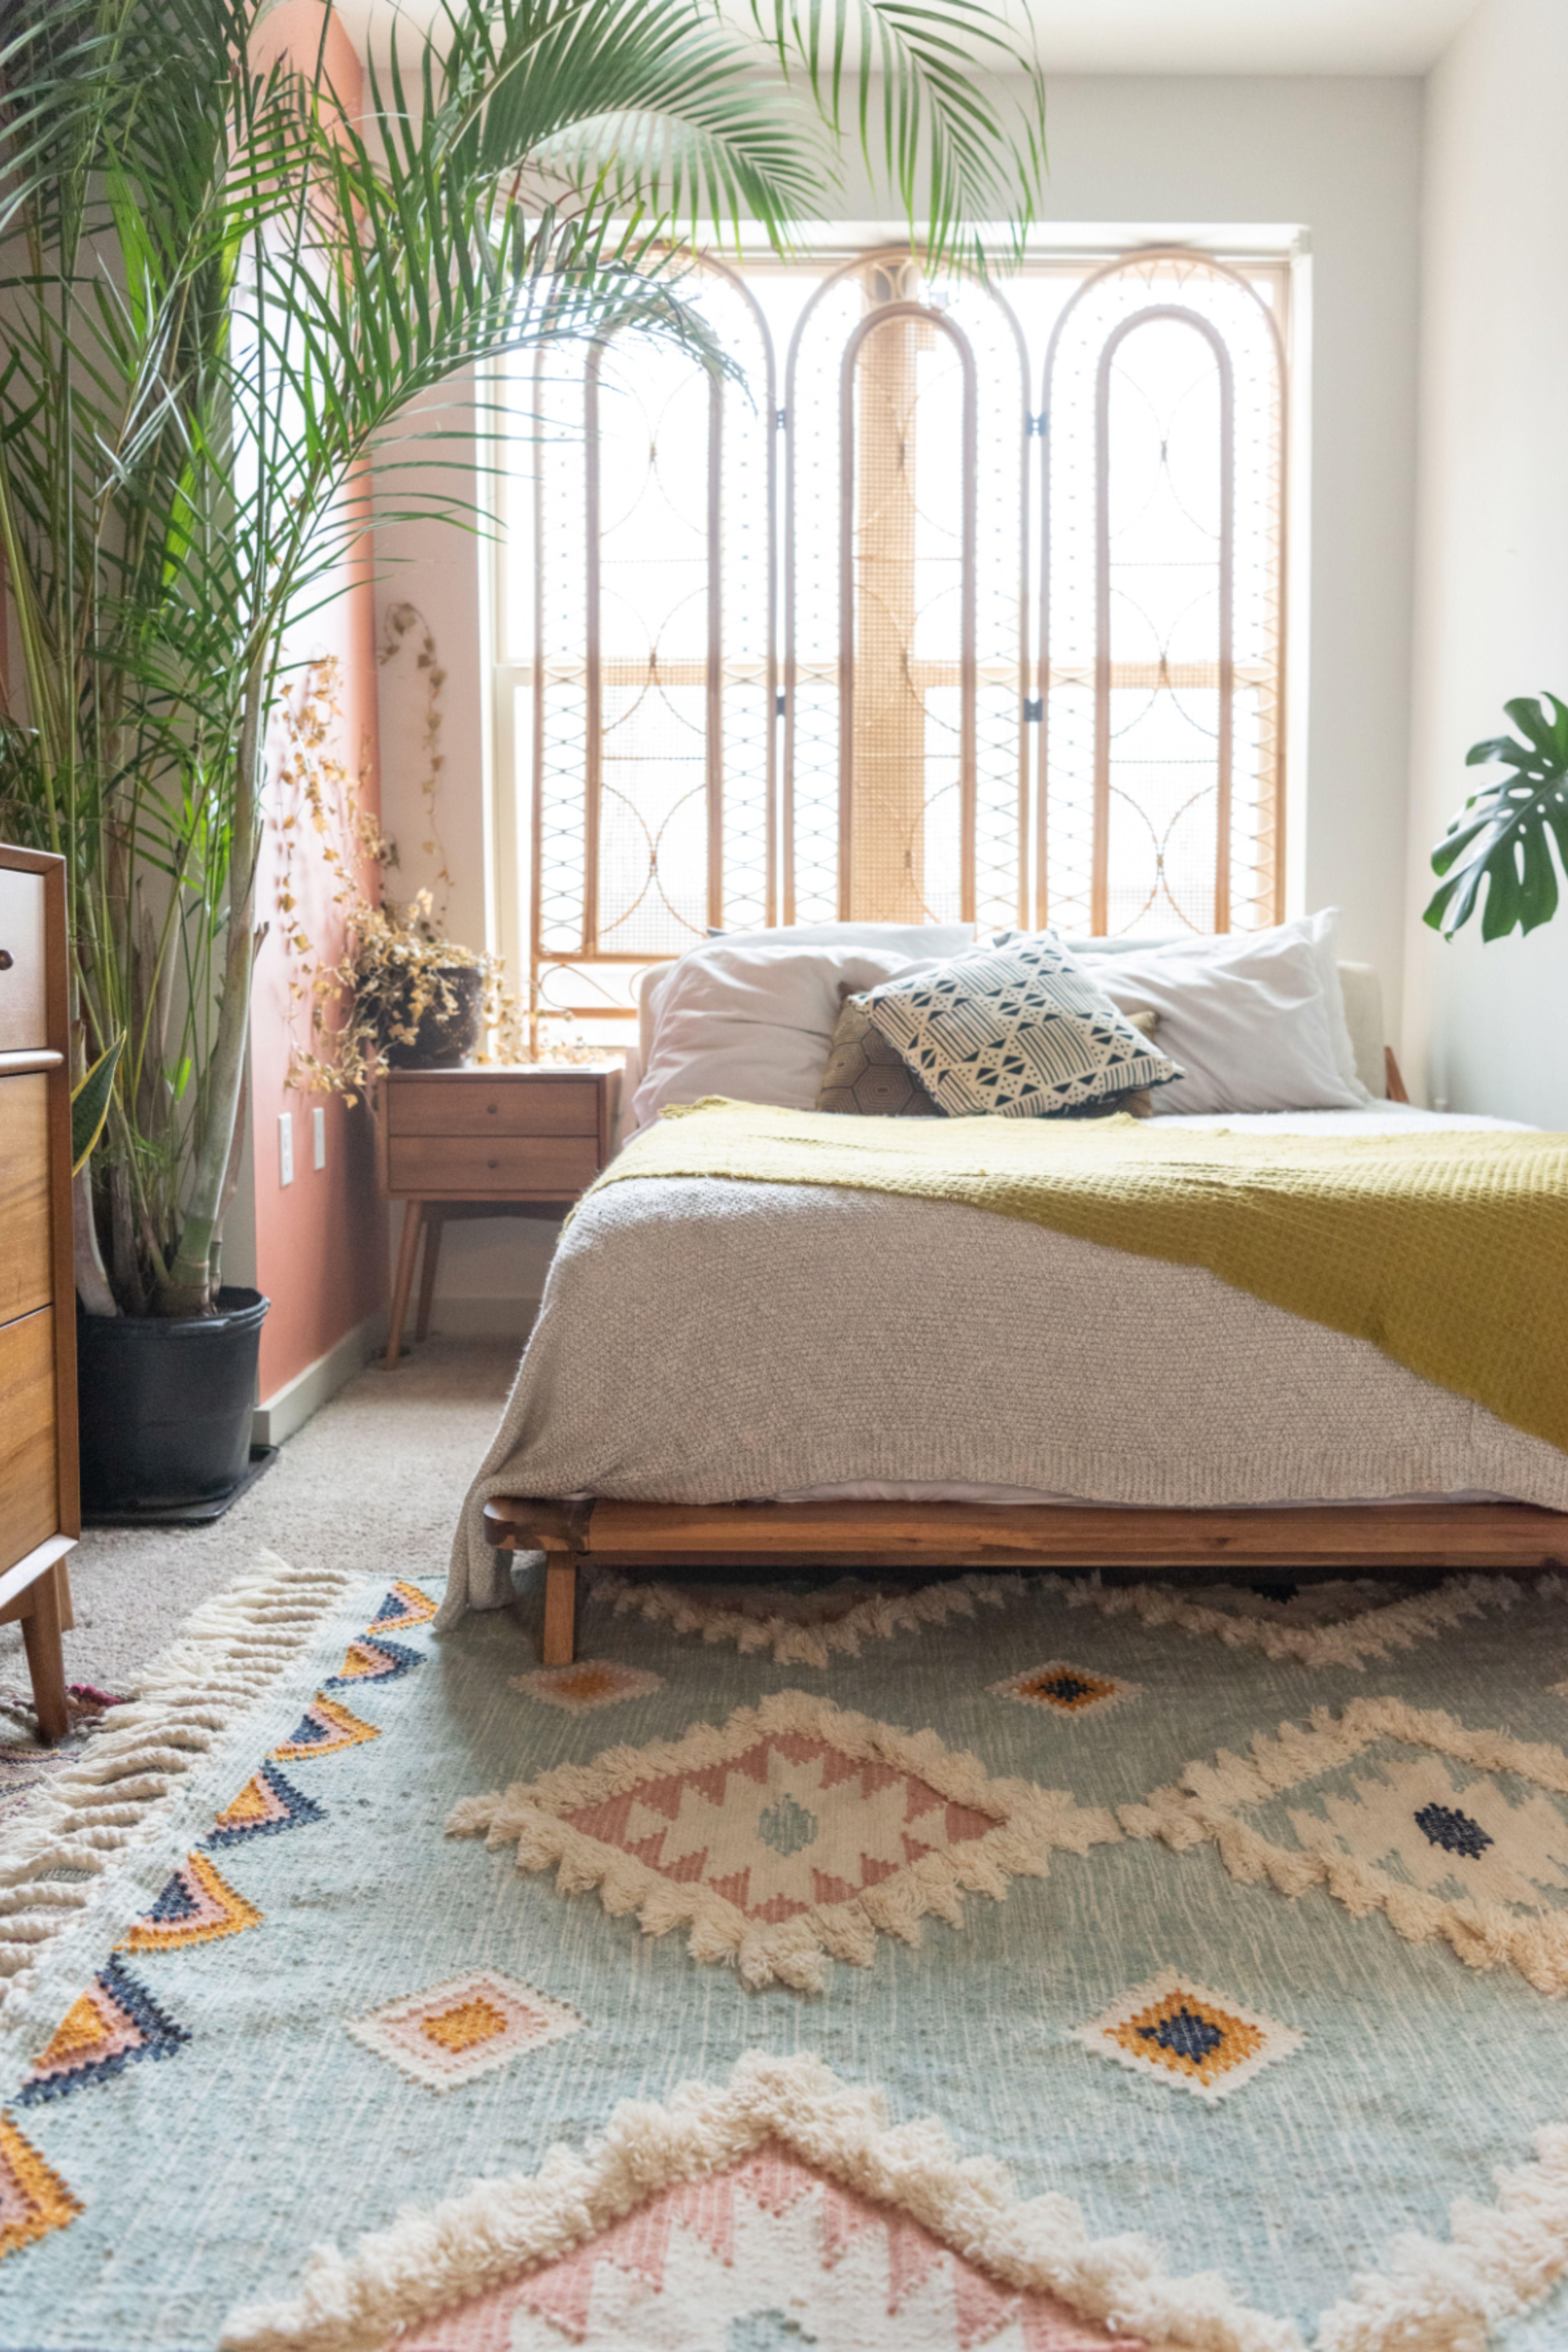 Bohemian Bedroom Decor -   - #basichomedecor #bedroom #bohemian #cutehomedecorations #decor #decorationappartement #decorationsejour #diyhomepictures #diyHousedesign #diyInteriordesign #Housestyles #simplehousediy #bohemianbedrooms